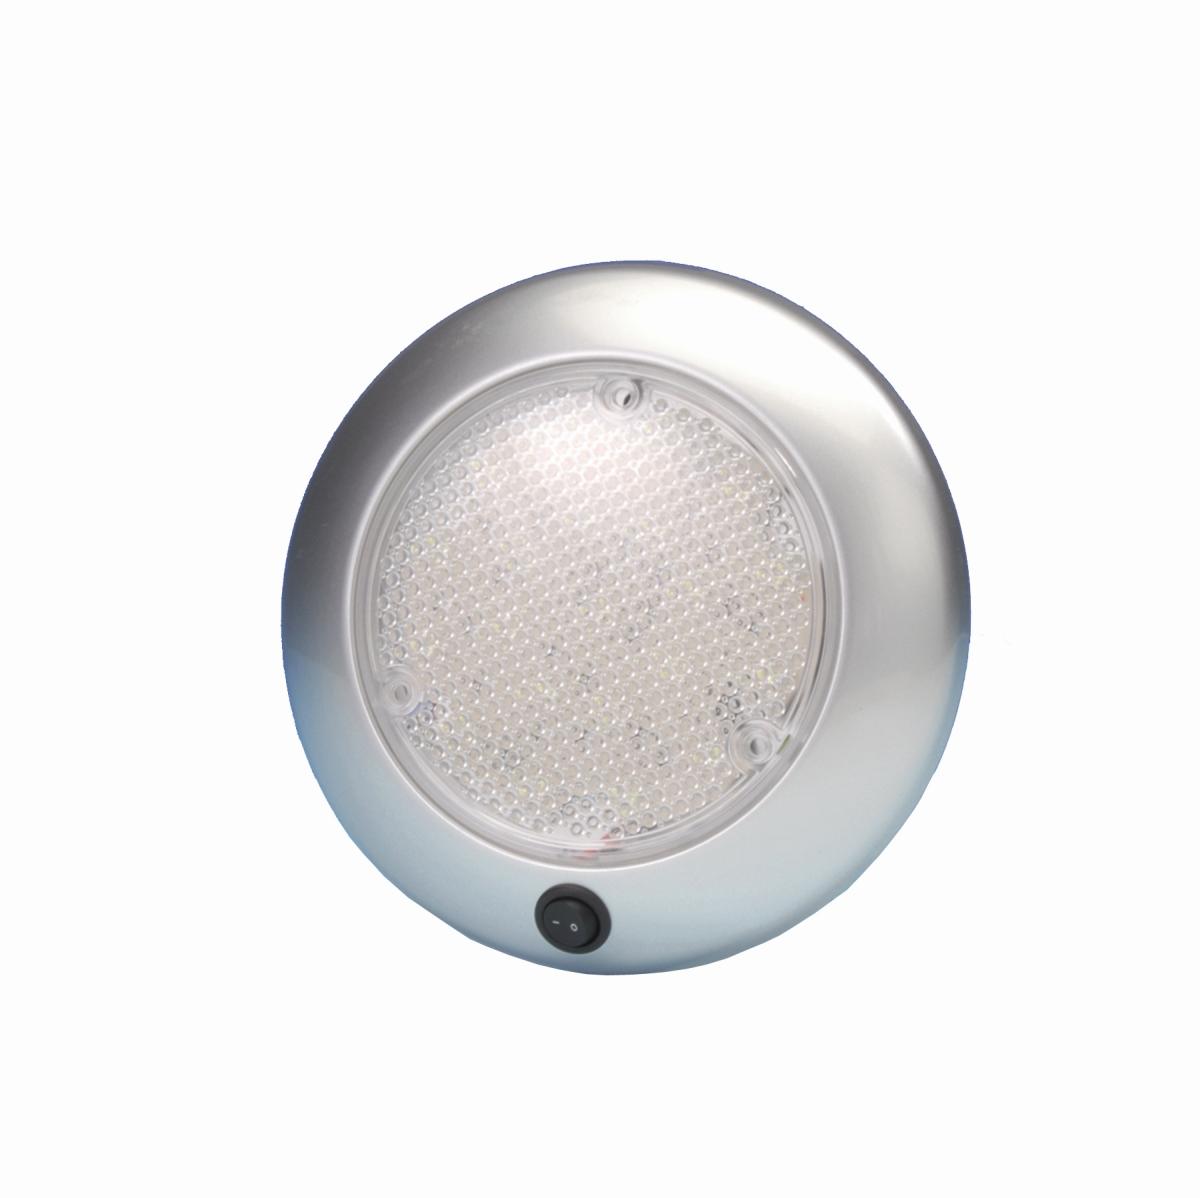 LED-Deckenleuchte DOME